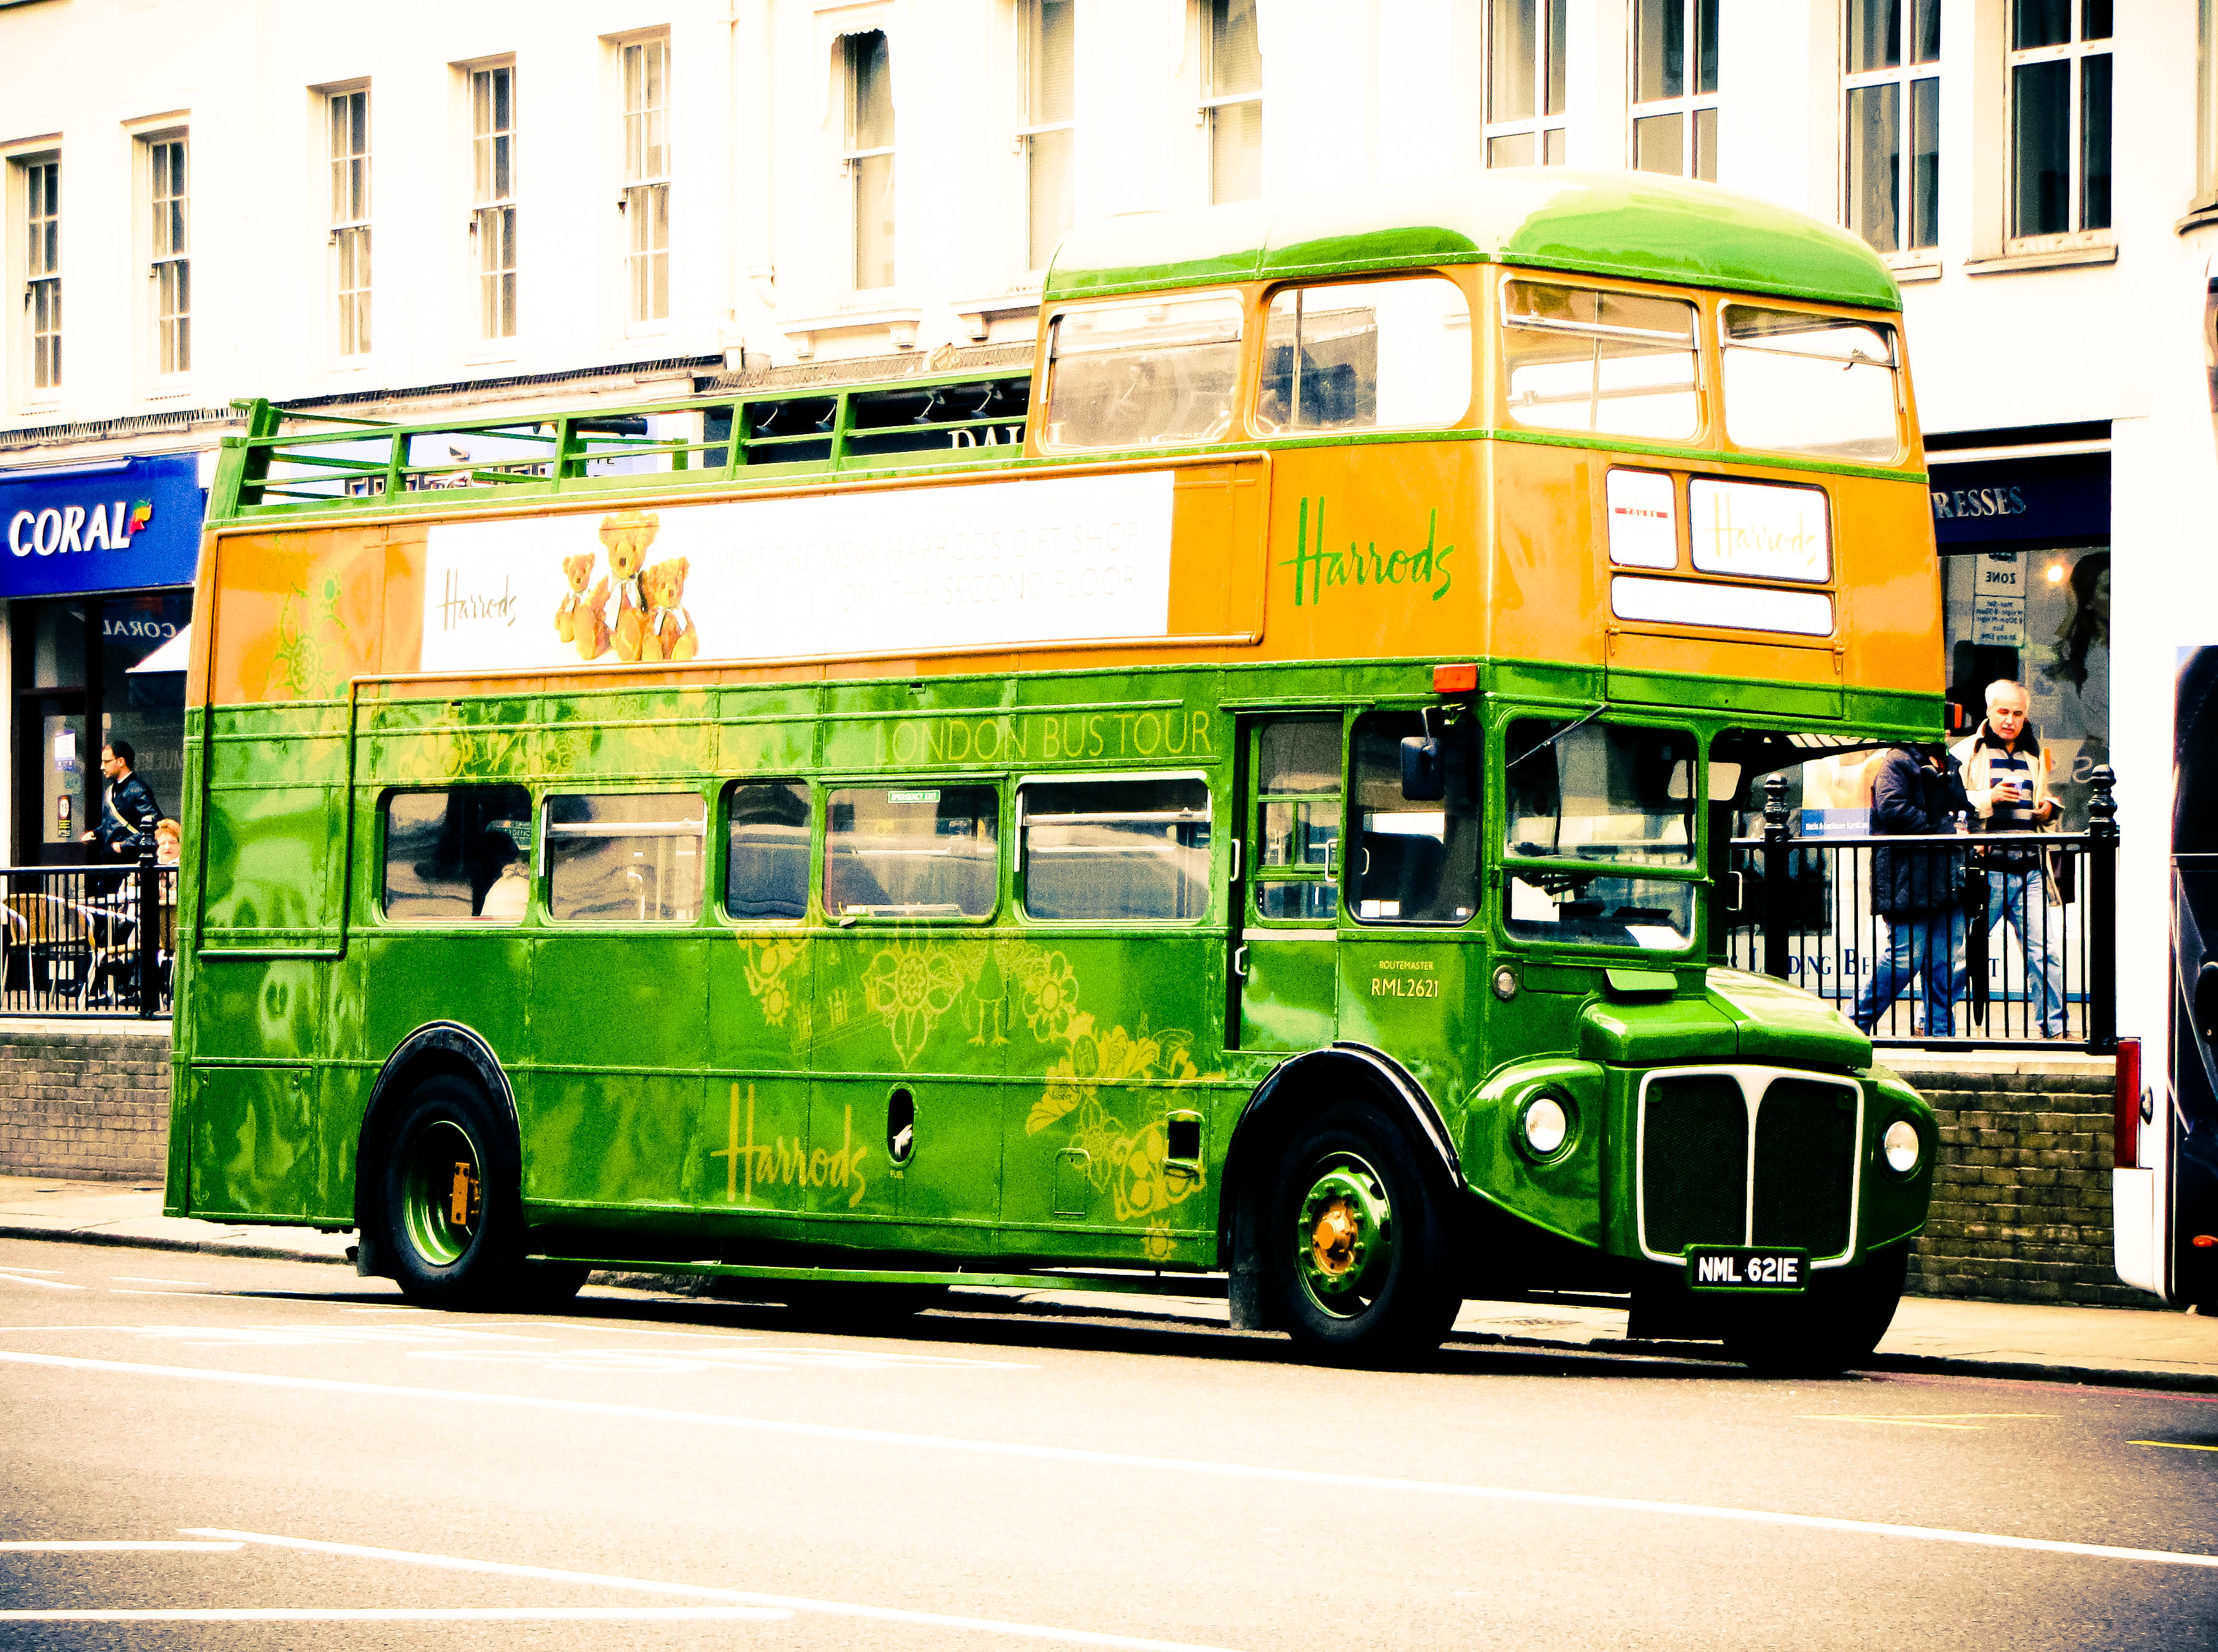 London green bus wallpaper   ForWallpapercom 3616x2694